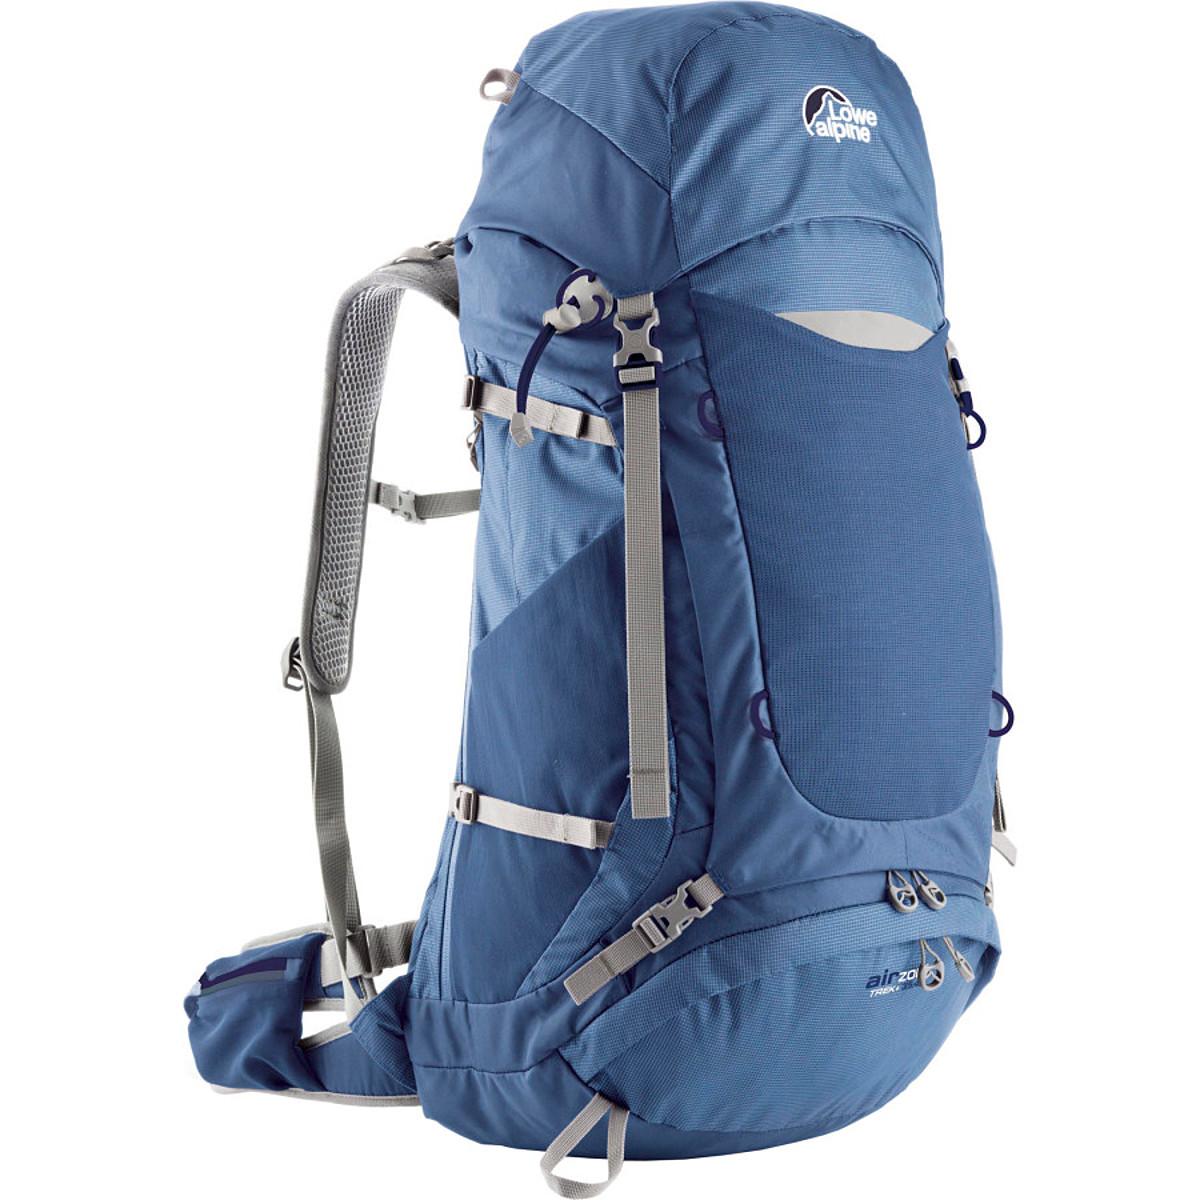 photo: Lowe Alpine AirZone Trek + 35:45 overnight pack (2,000 - 2,999 cu in)